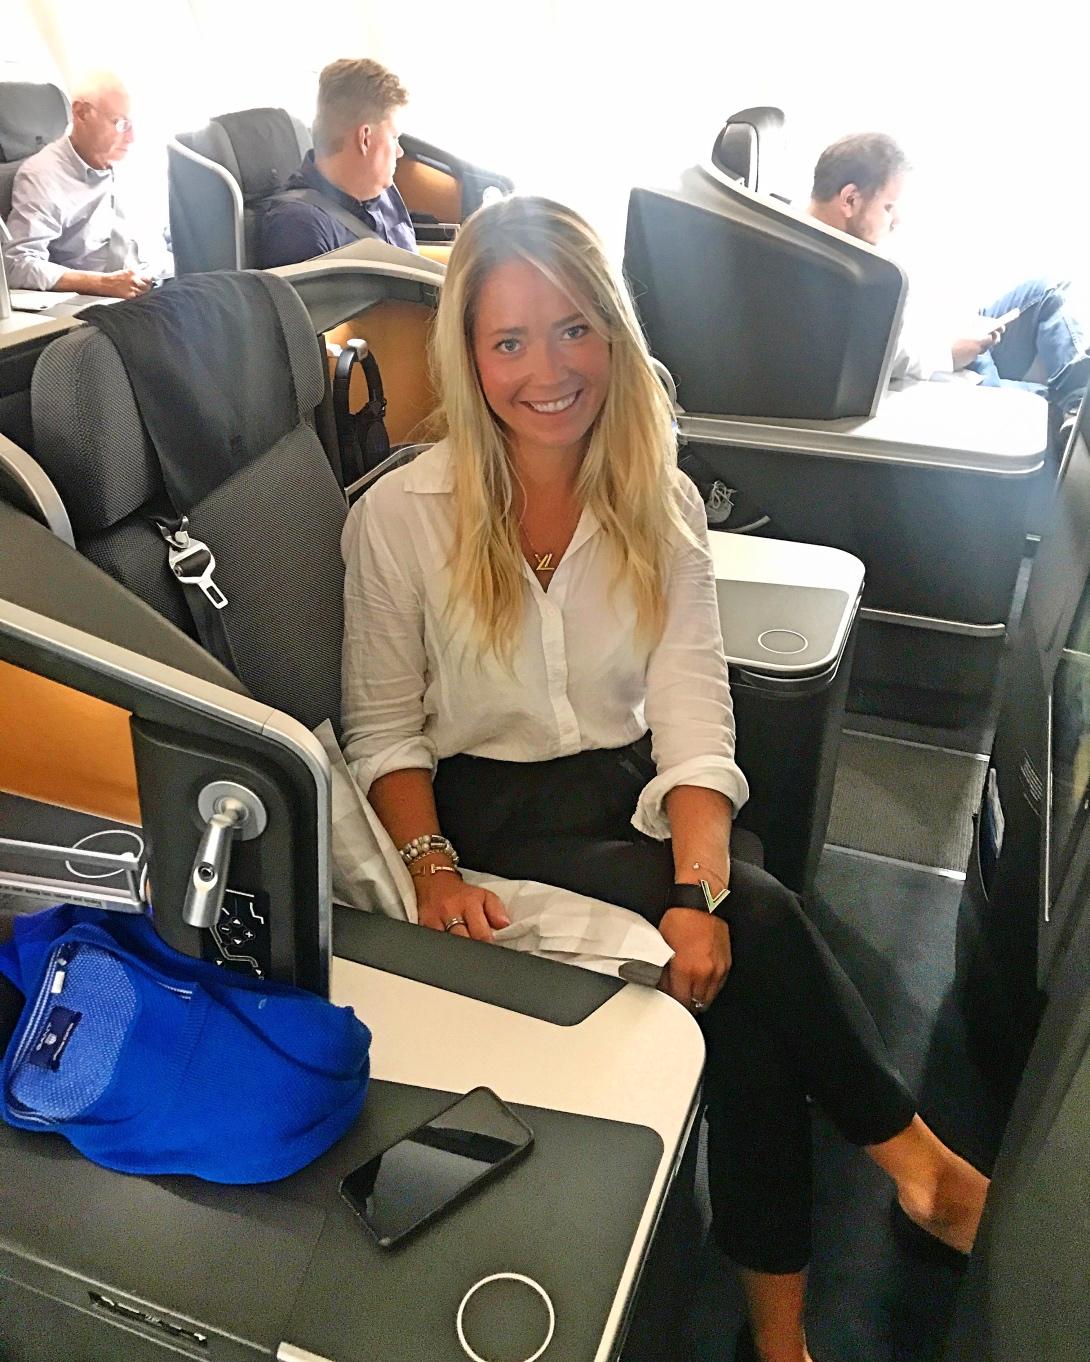 SAS Business Class